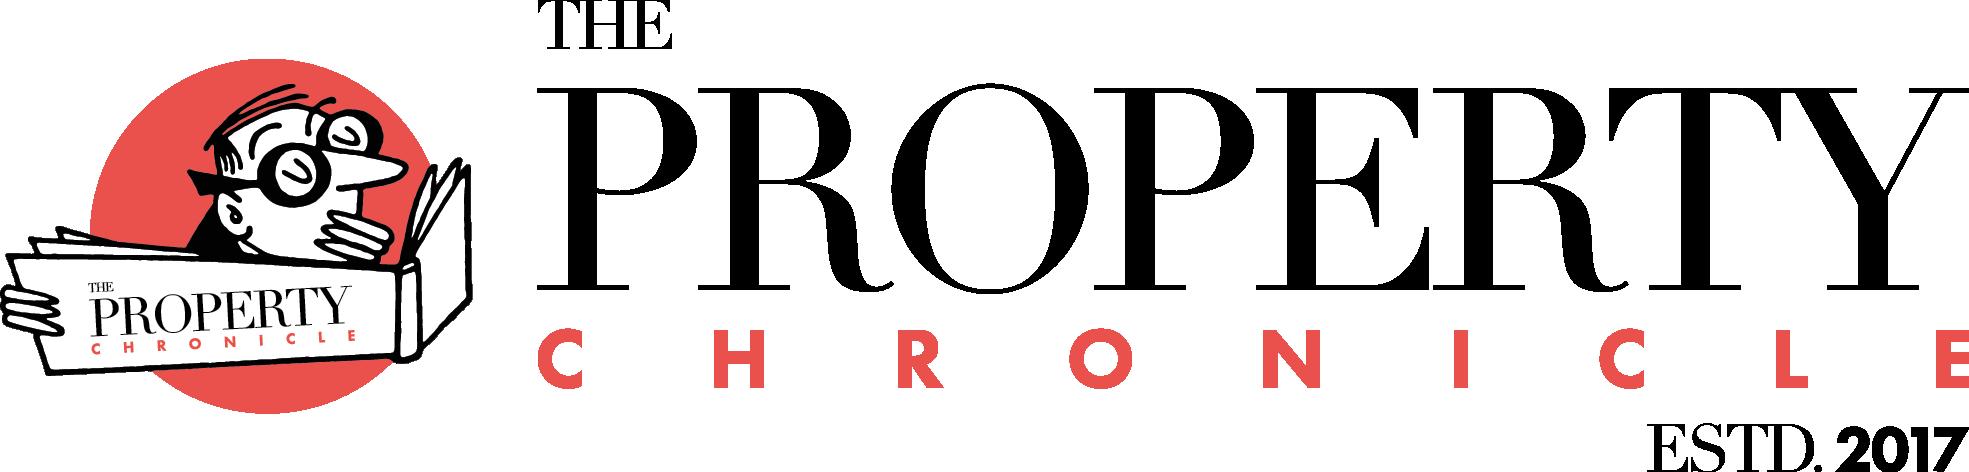 nnara chronicles pdf download free